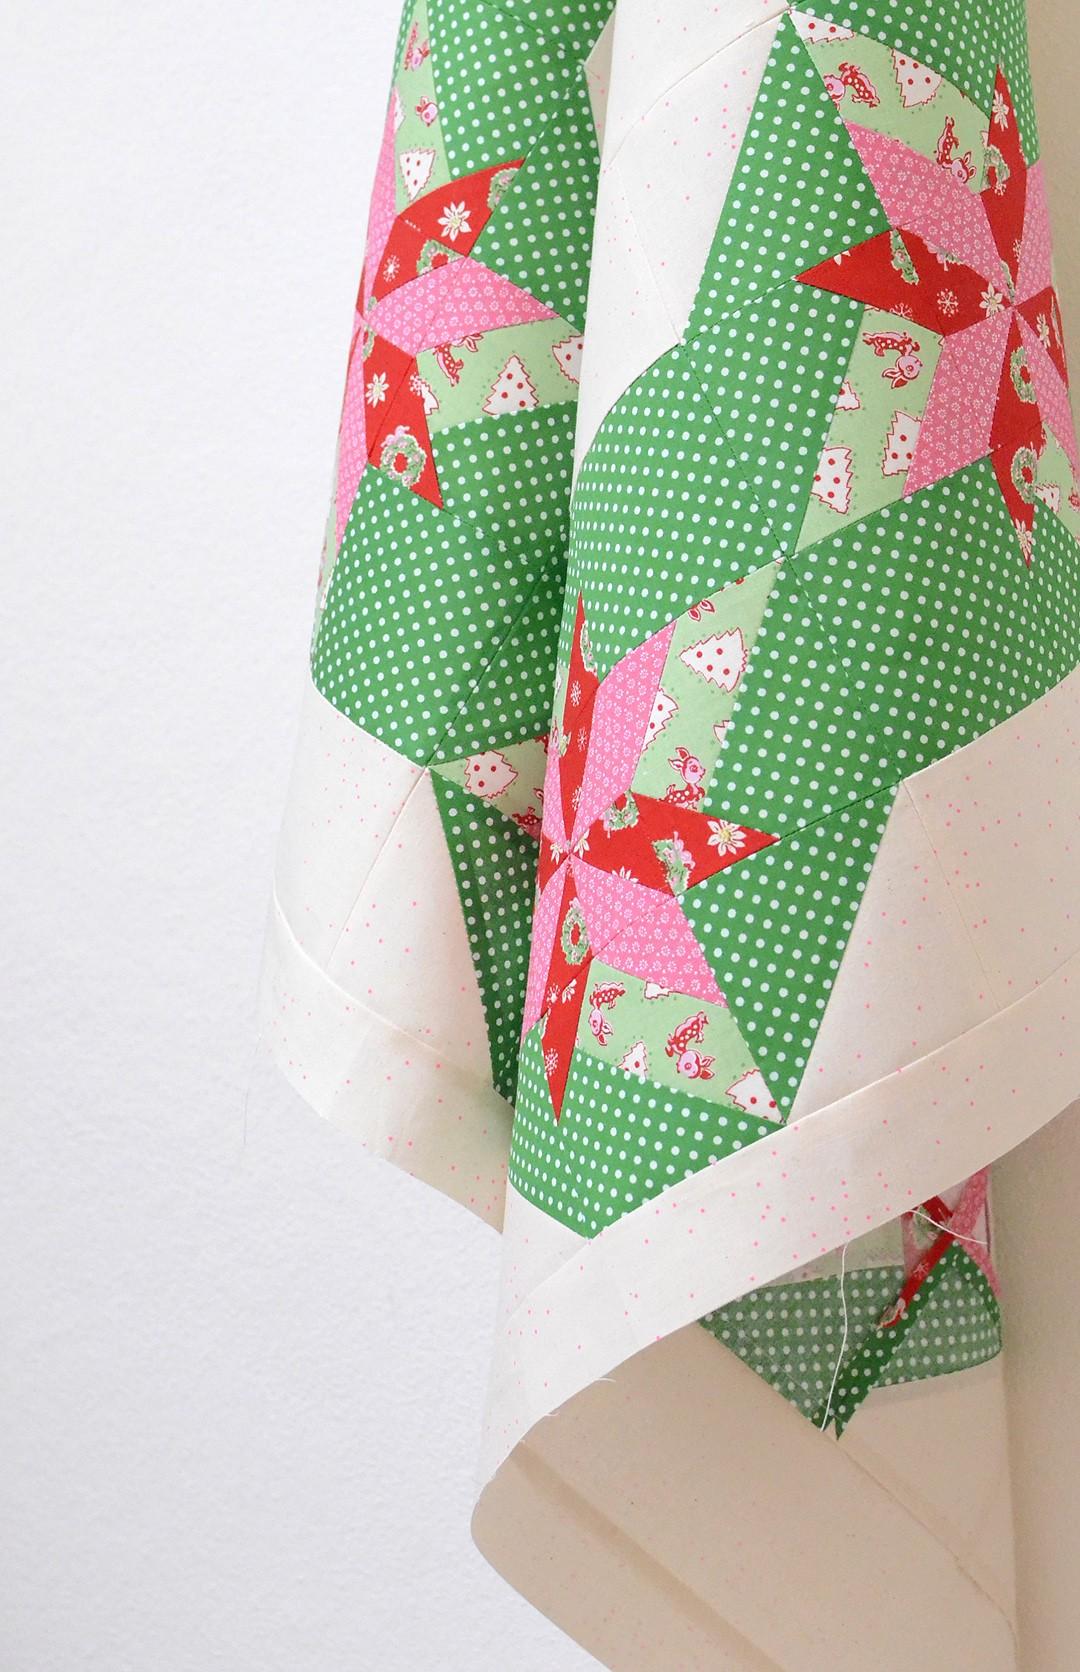 merry-bright-quilt-1